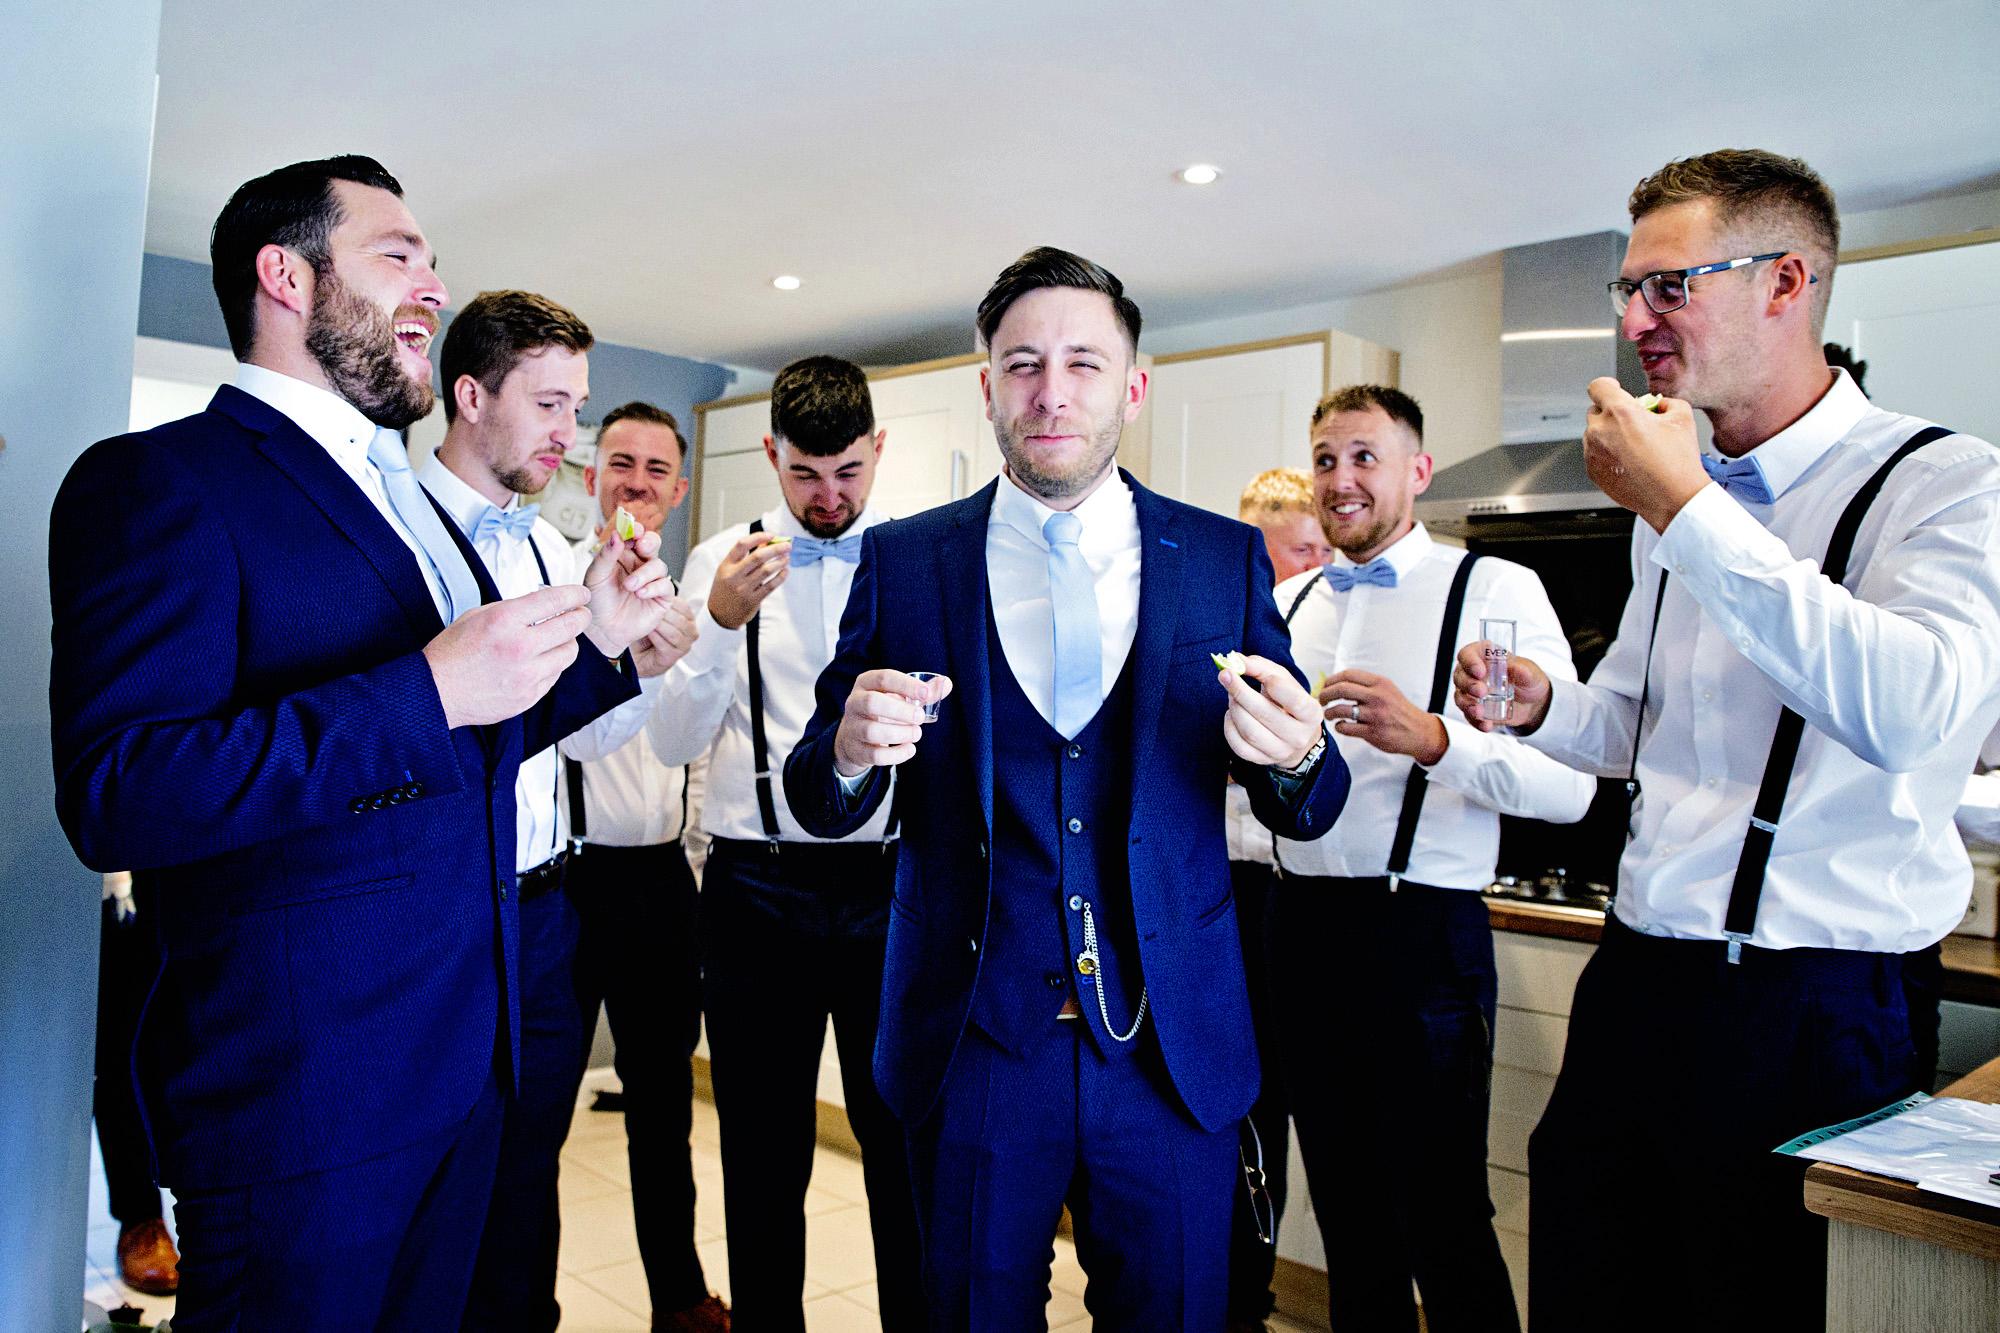 wedding-barnsdale-hall (11).jpg